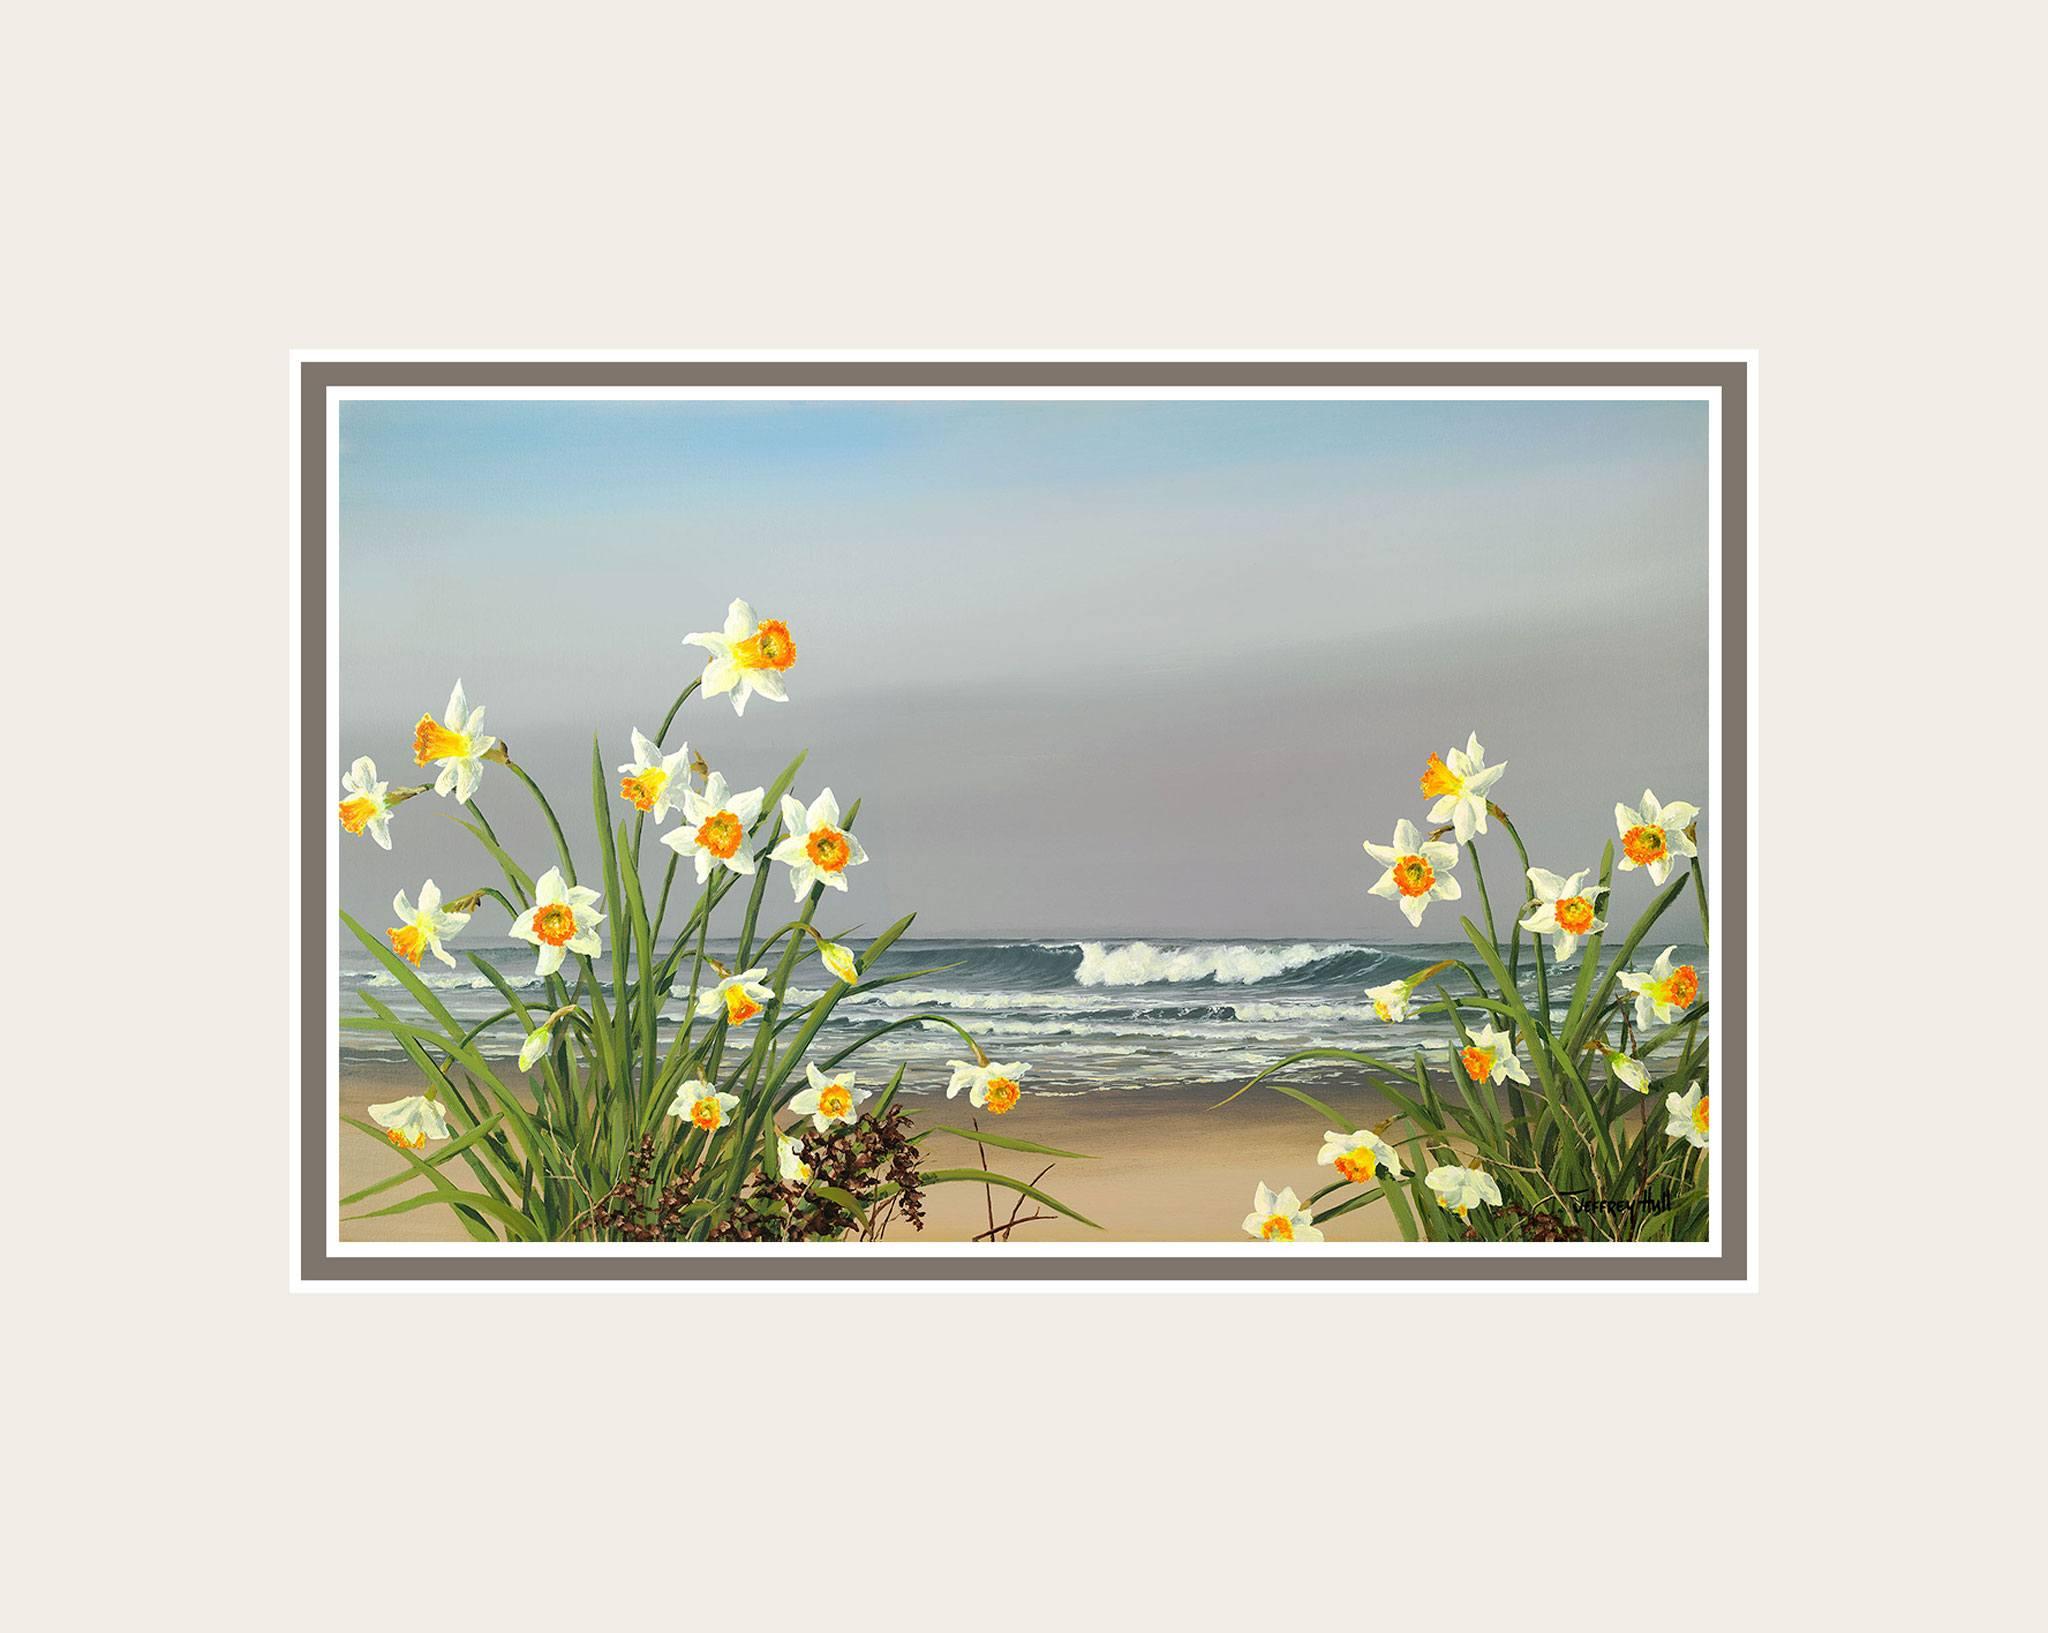 Shoreline-Daffodils-Mini-Unframed-Talc-Balmoral-4-Website-2021